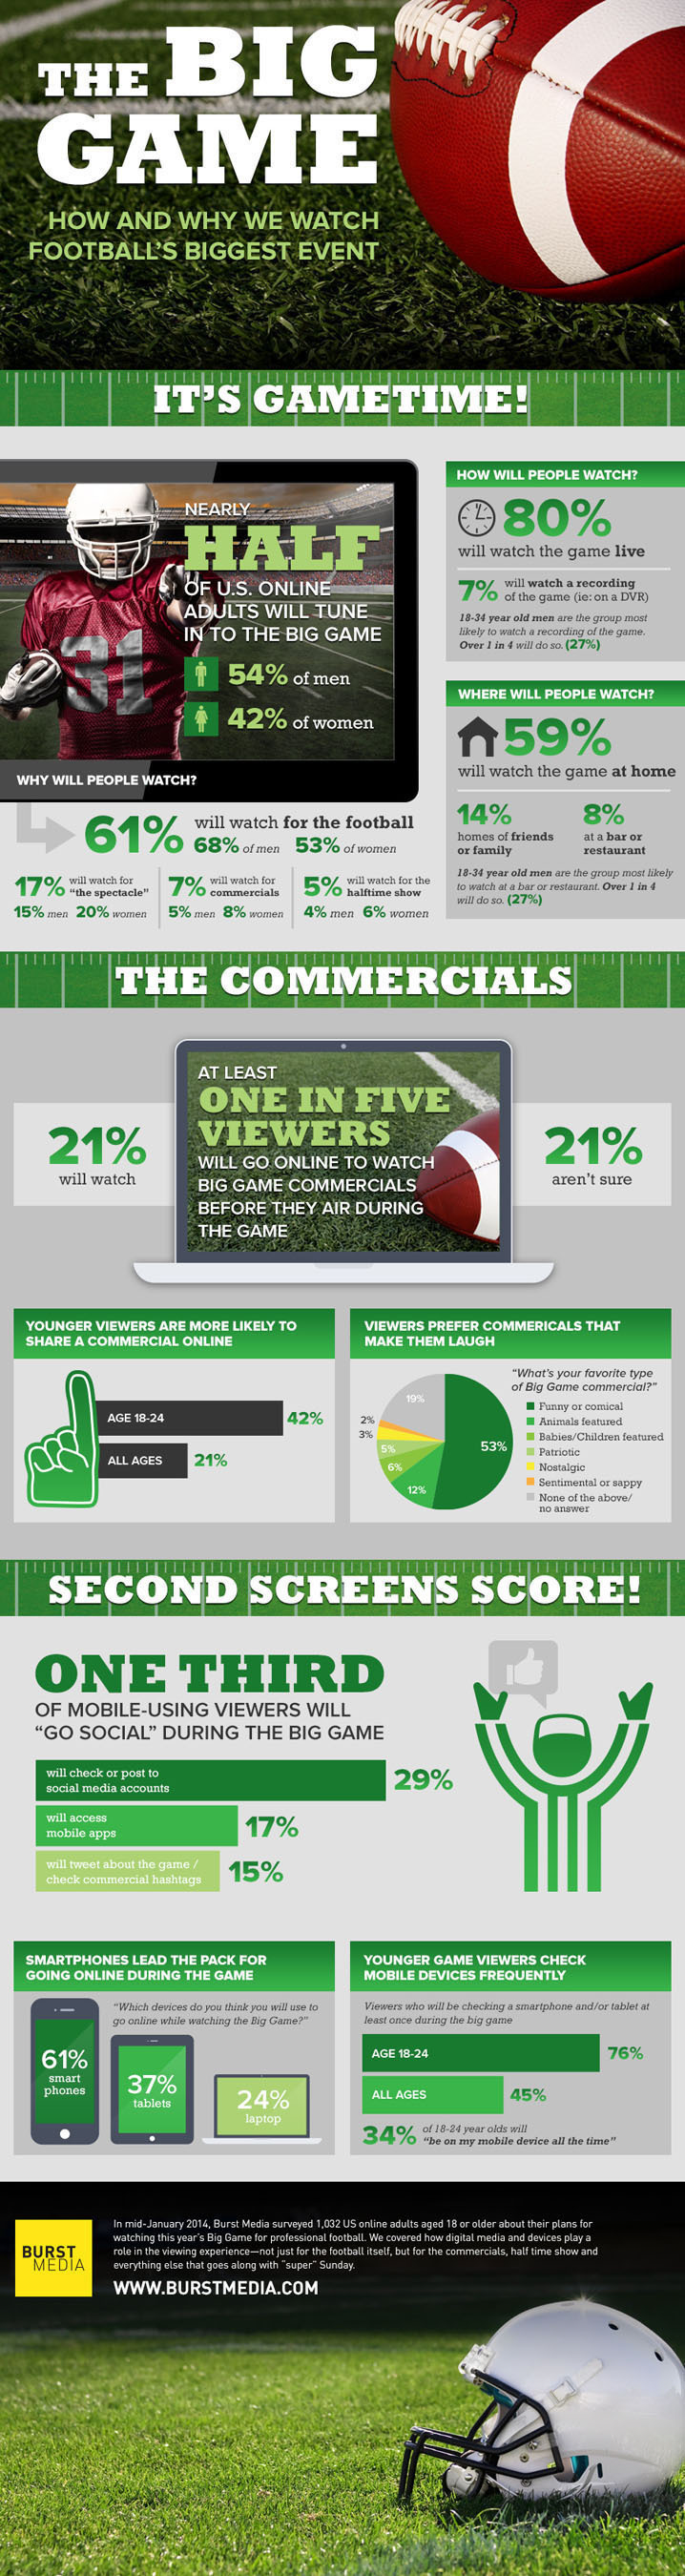 The Big Game: How and Why We Watch Football's Biggest Event. (PRNewsFoto/Burst Media) (PRNewsFoto/BURST ...